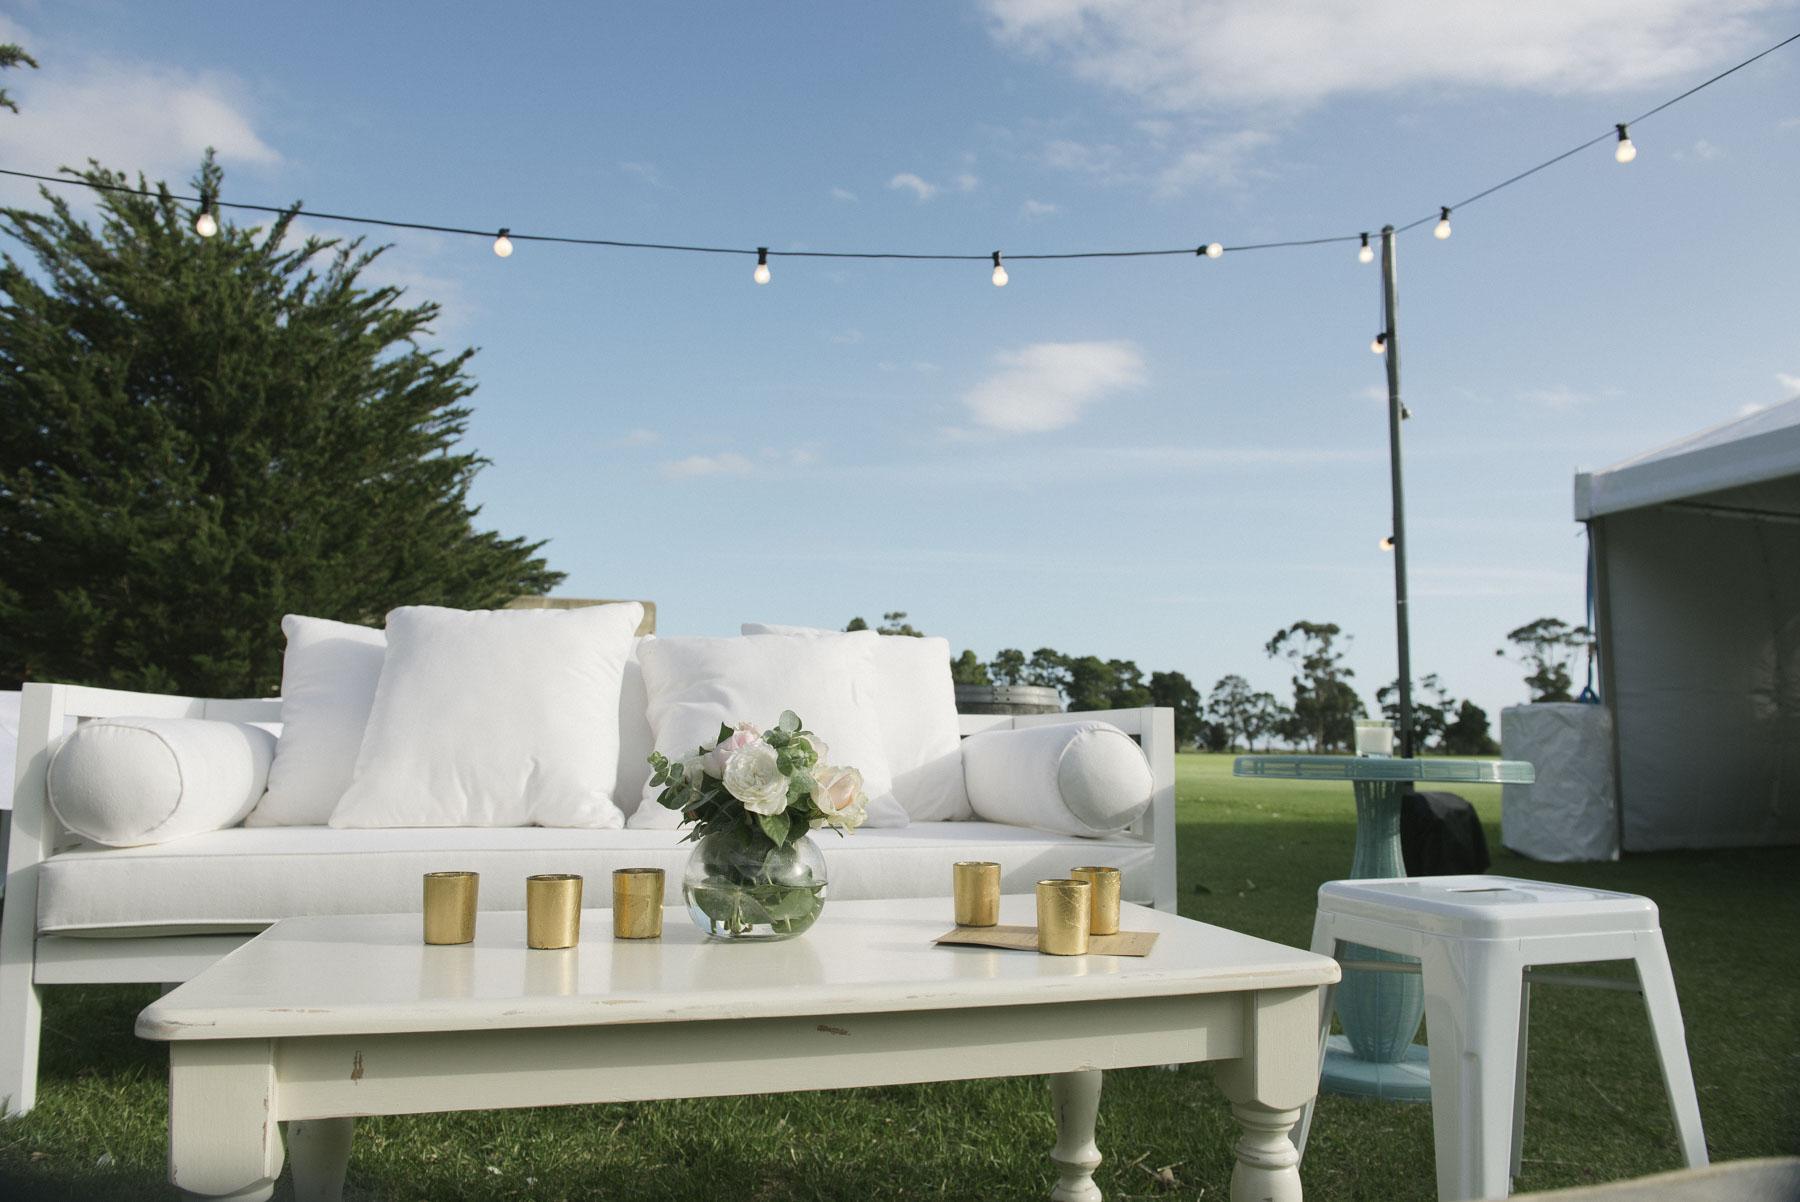 1501vand-285alan_moyle_wedding_portrait_brighton_bayside_werribee_estate_mansion_zoo_rustic_styled_garden_mansion_candid_documentry_victoria_whitelaw.jpg